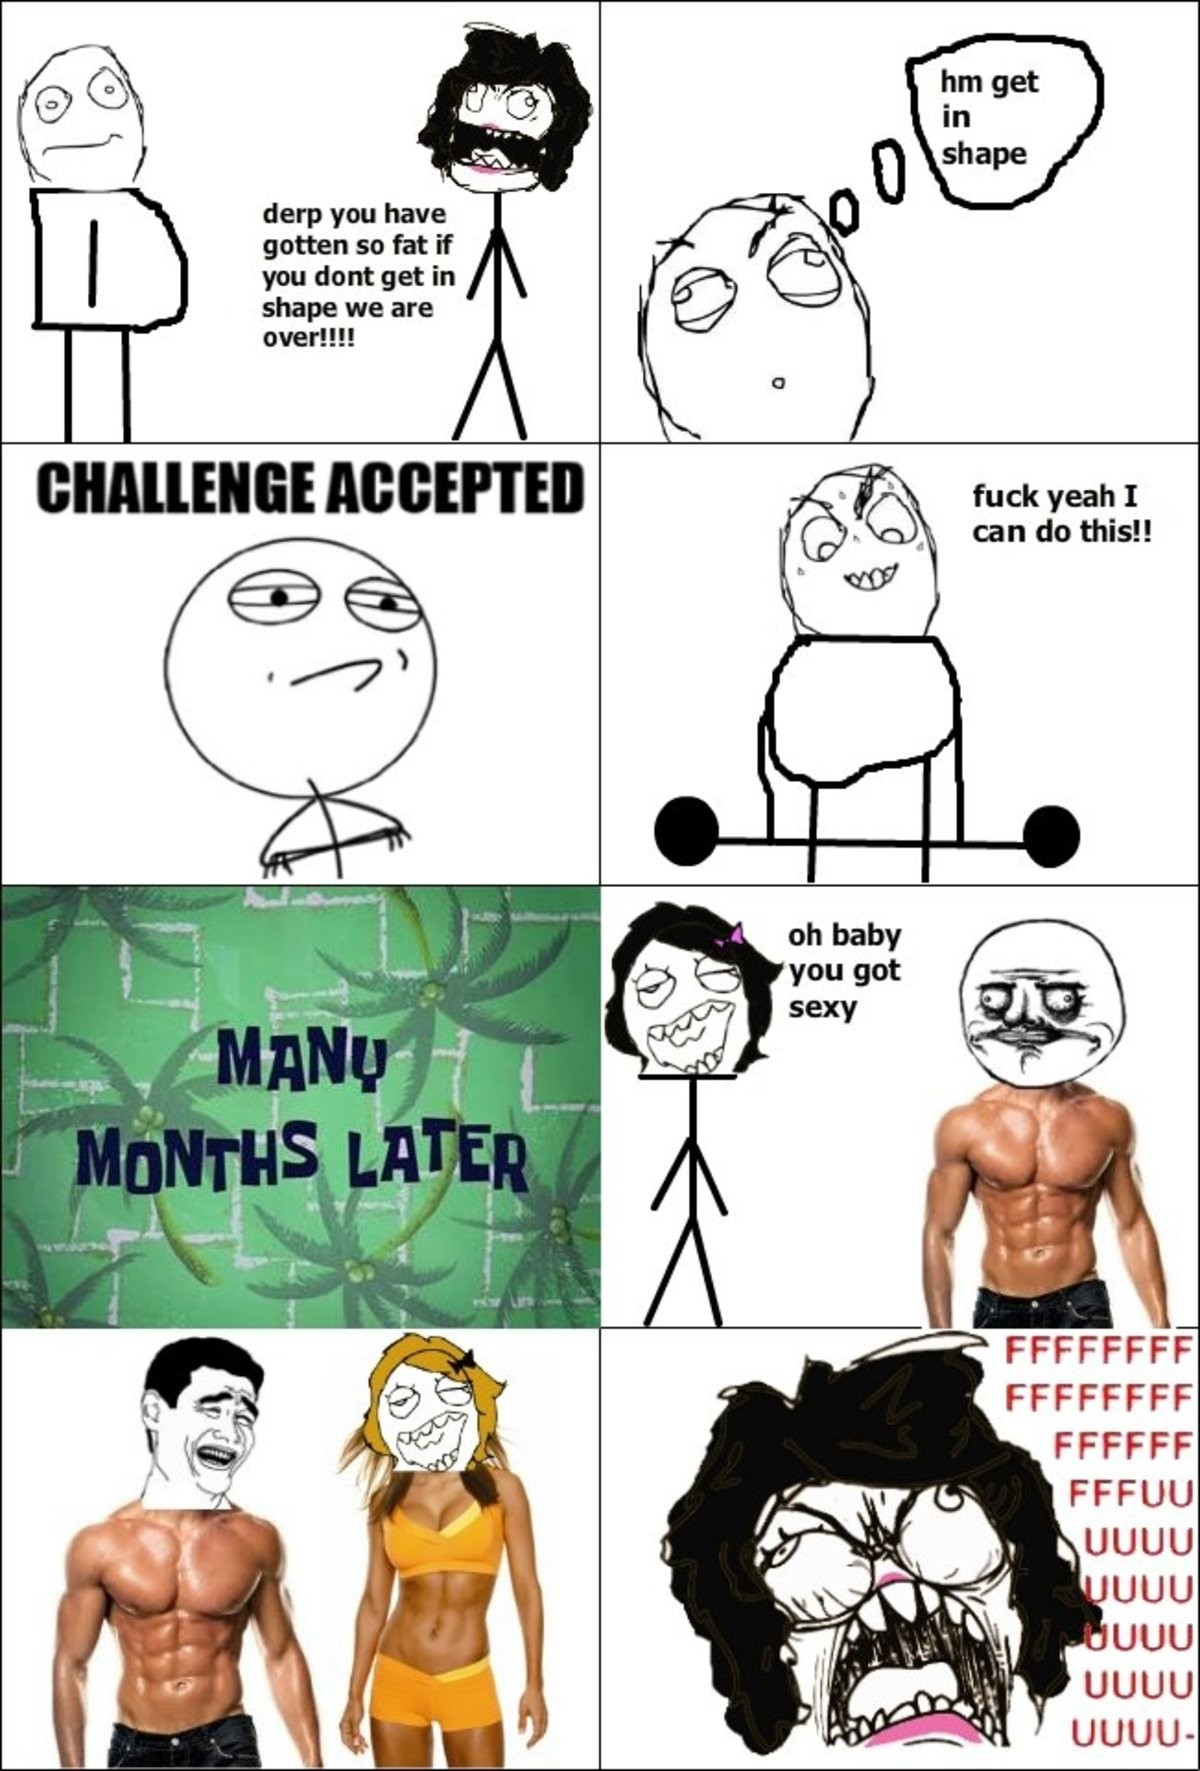 true story. .